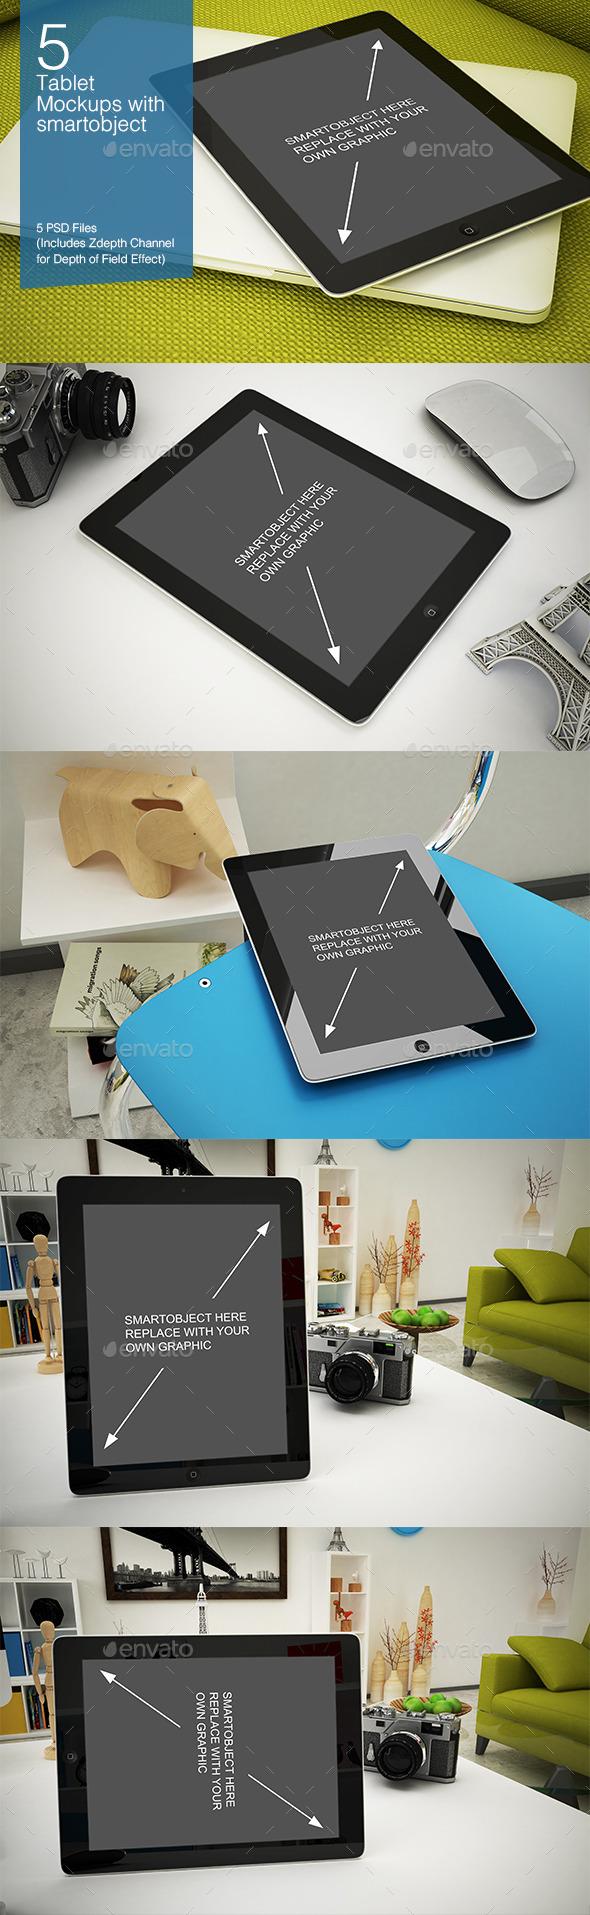 Tablet Mockup 5 Poses - Mobile Displays